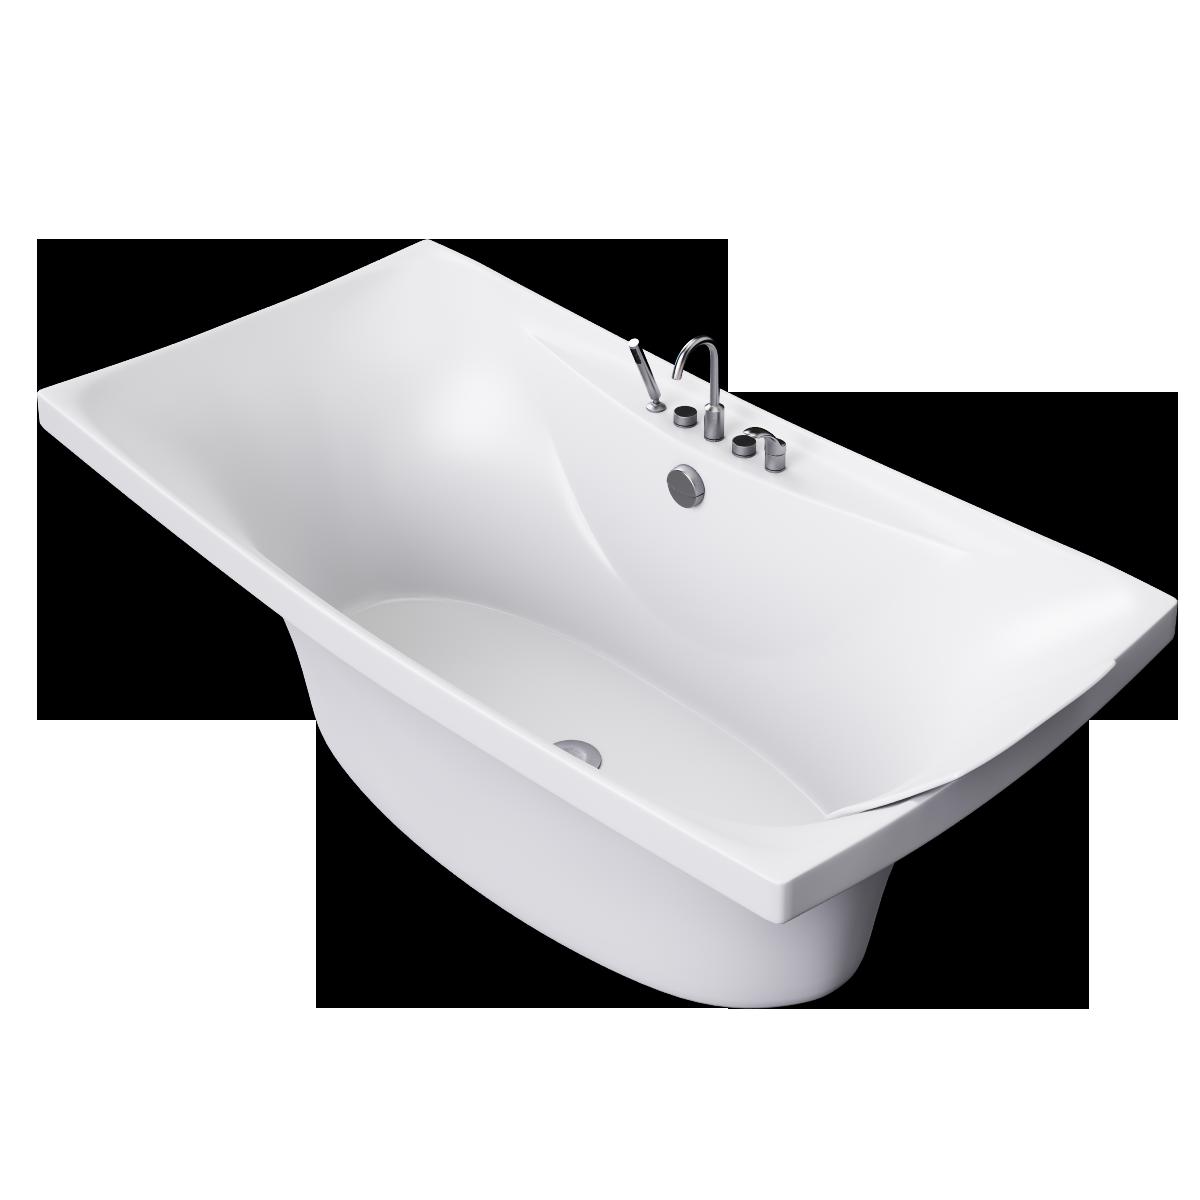 bath jacob delafon escale by rnax 3docean. Black Bedroom Furniture Sets. Home Design Ideas